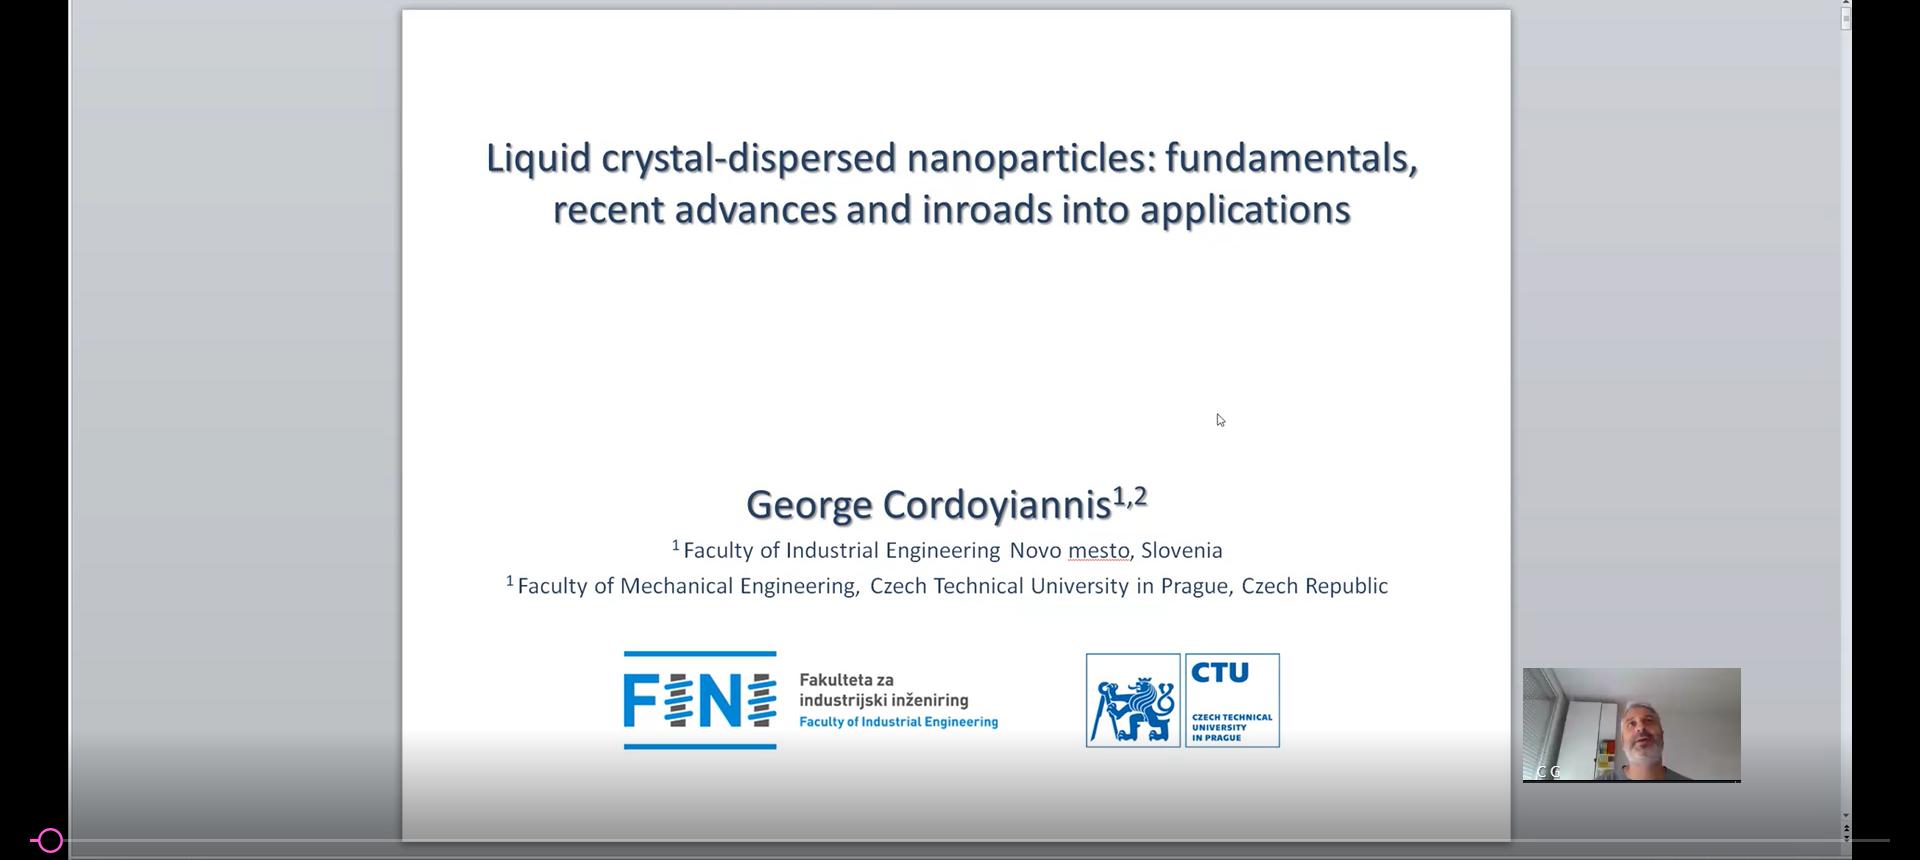 "Webinar: ""Liquid-crystal dispersed nanoparticles: fundamentals, recent advances and inroads into applications"""